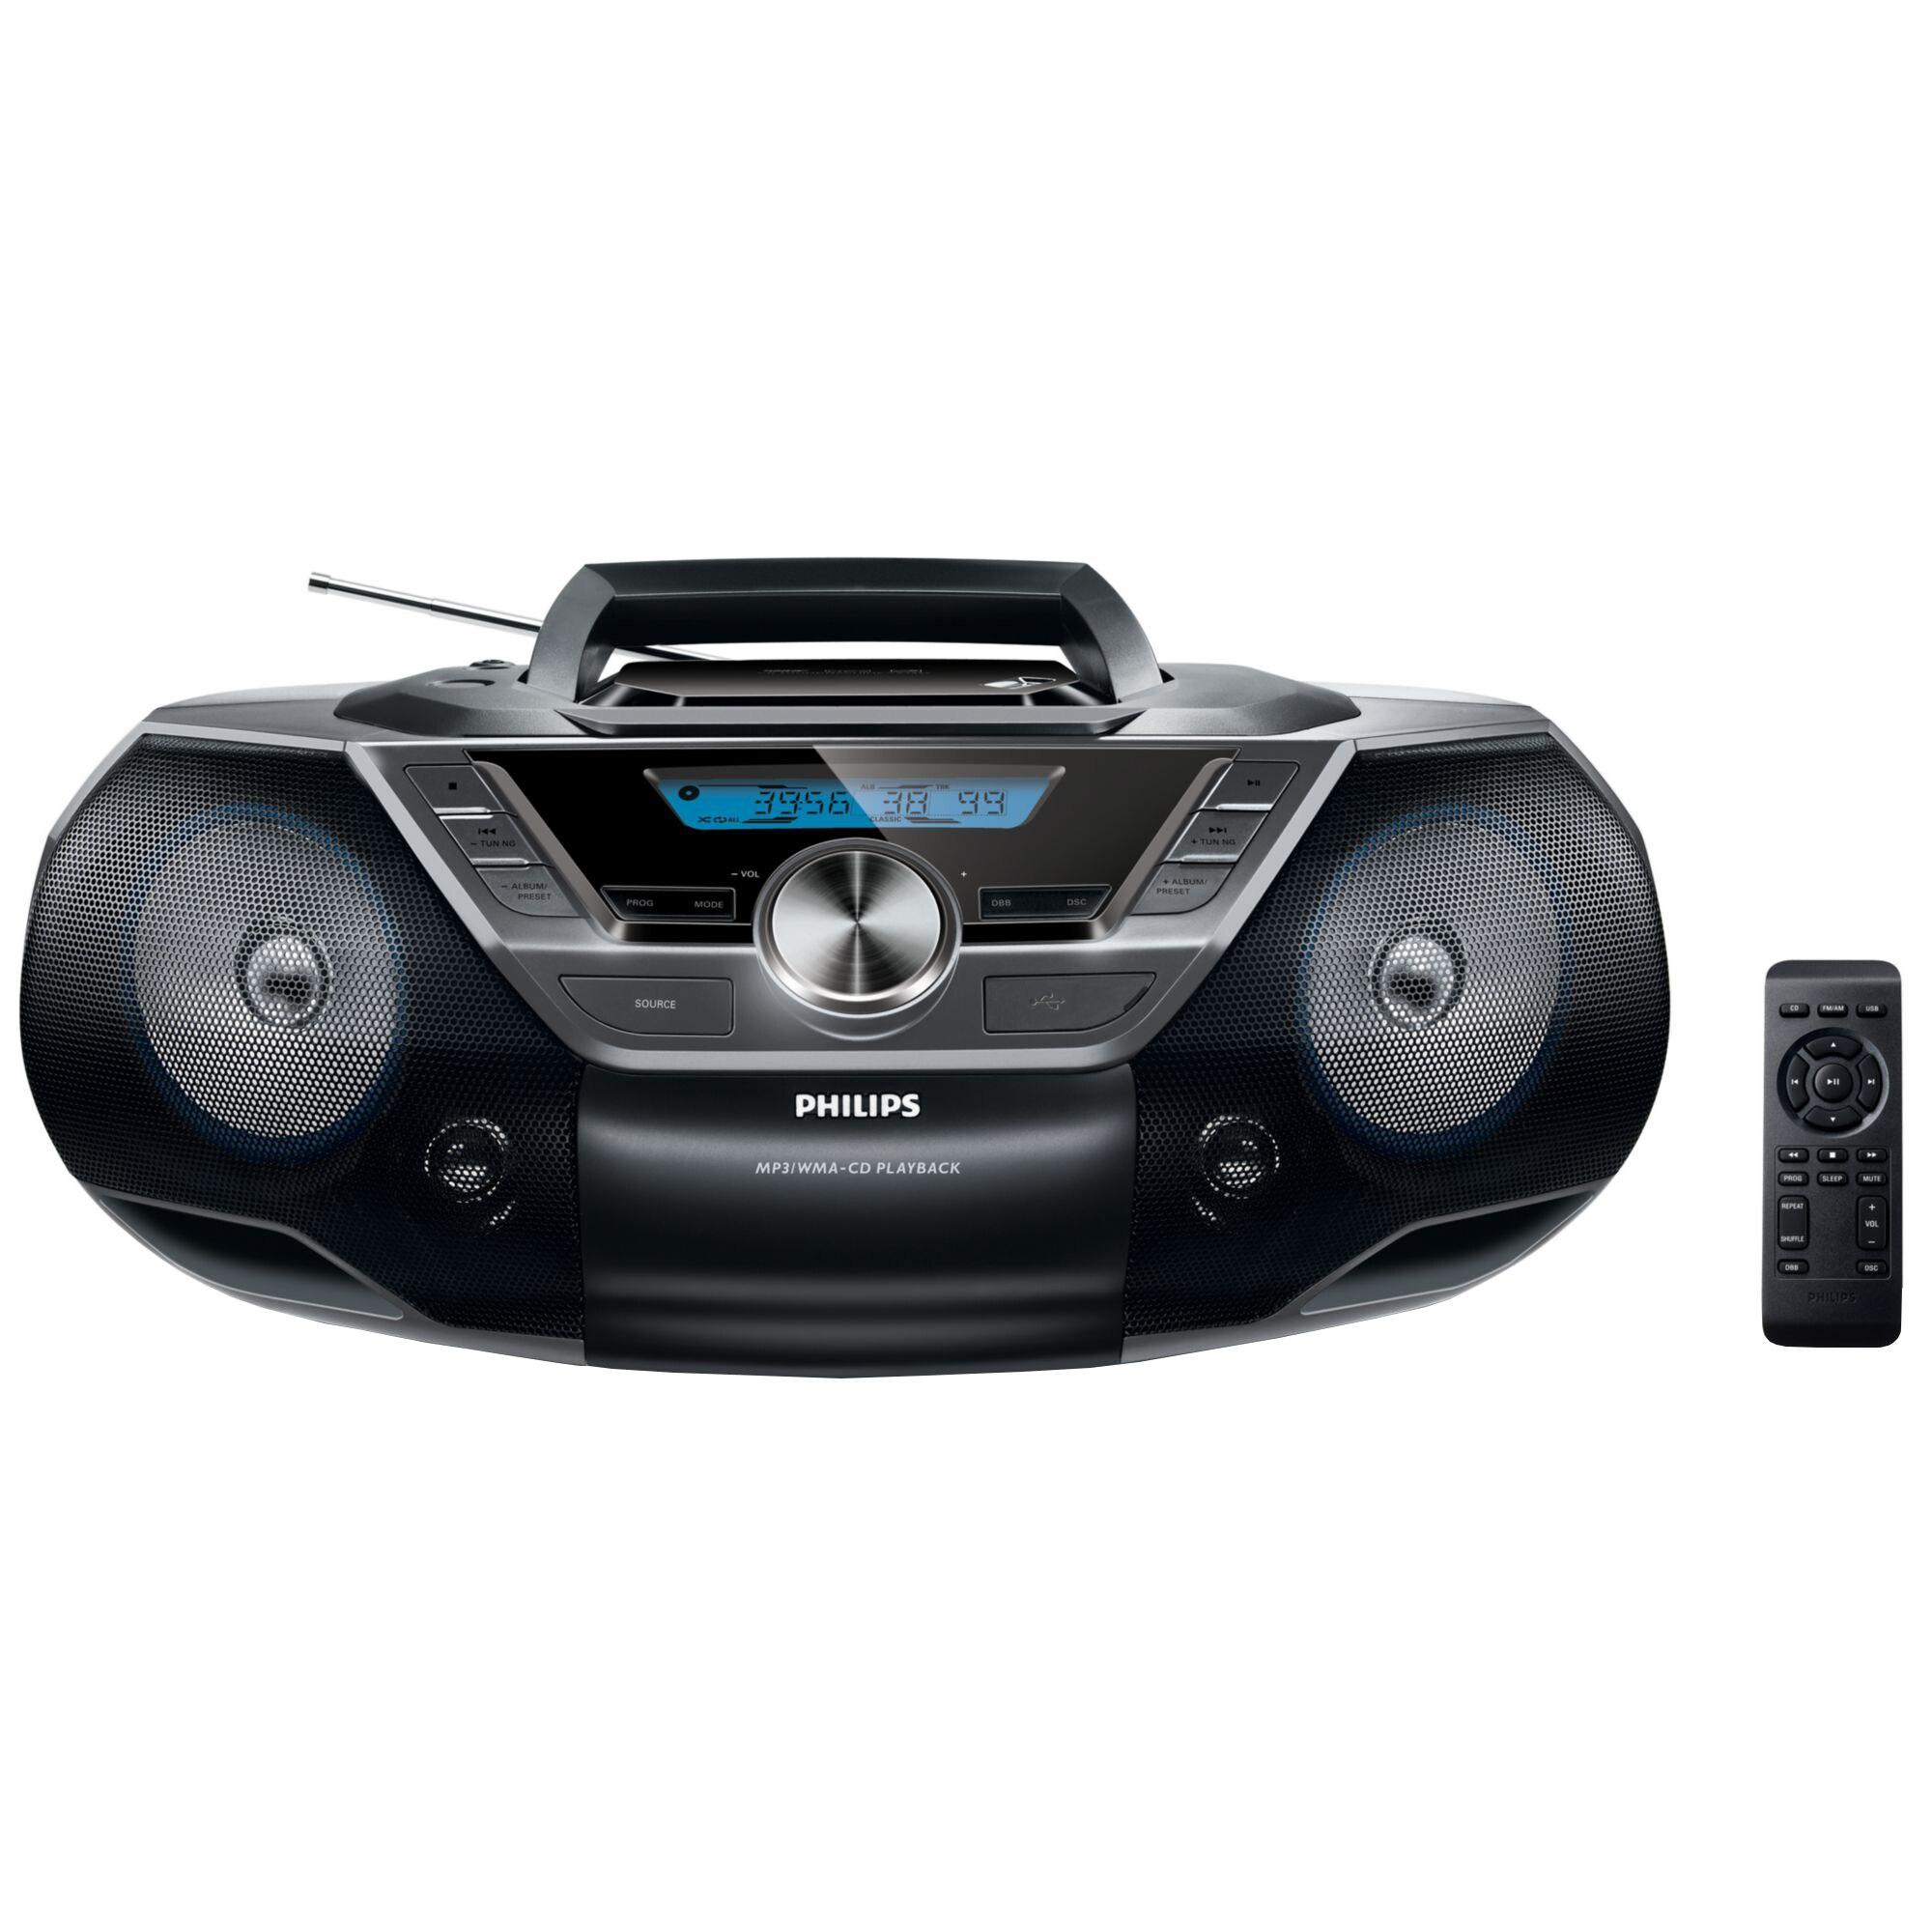 Fotografie Microsistem audio Philips AZ780/12, CD, MP3-CD, USB, FM, Telecomanda